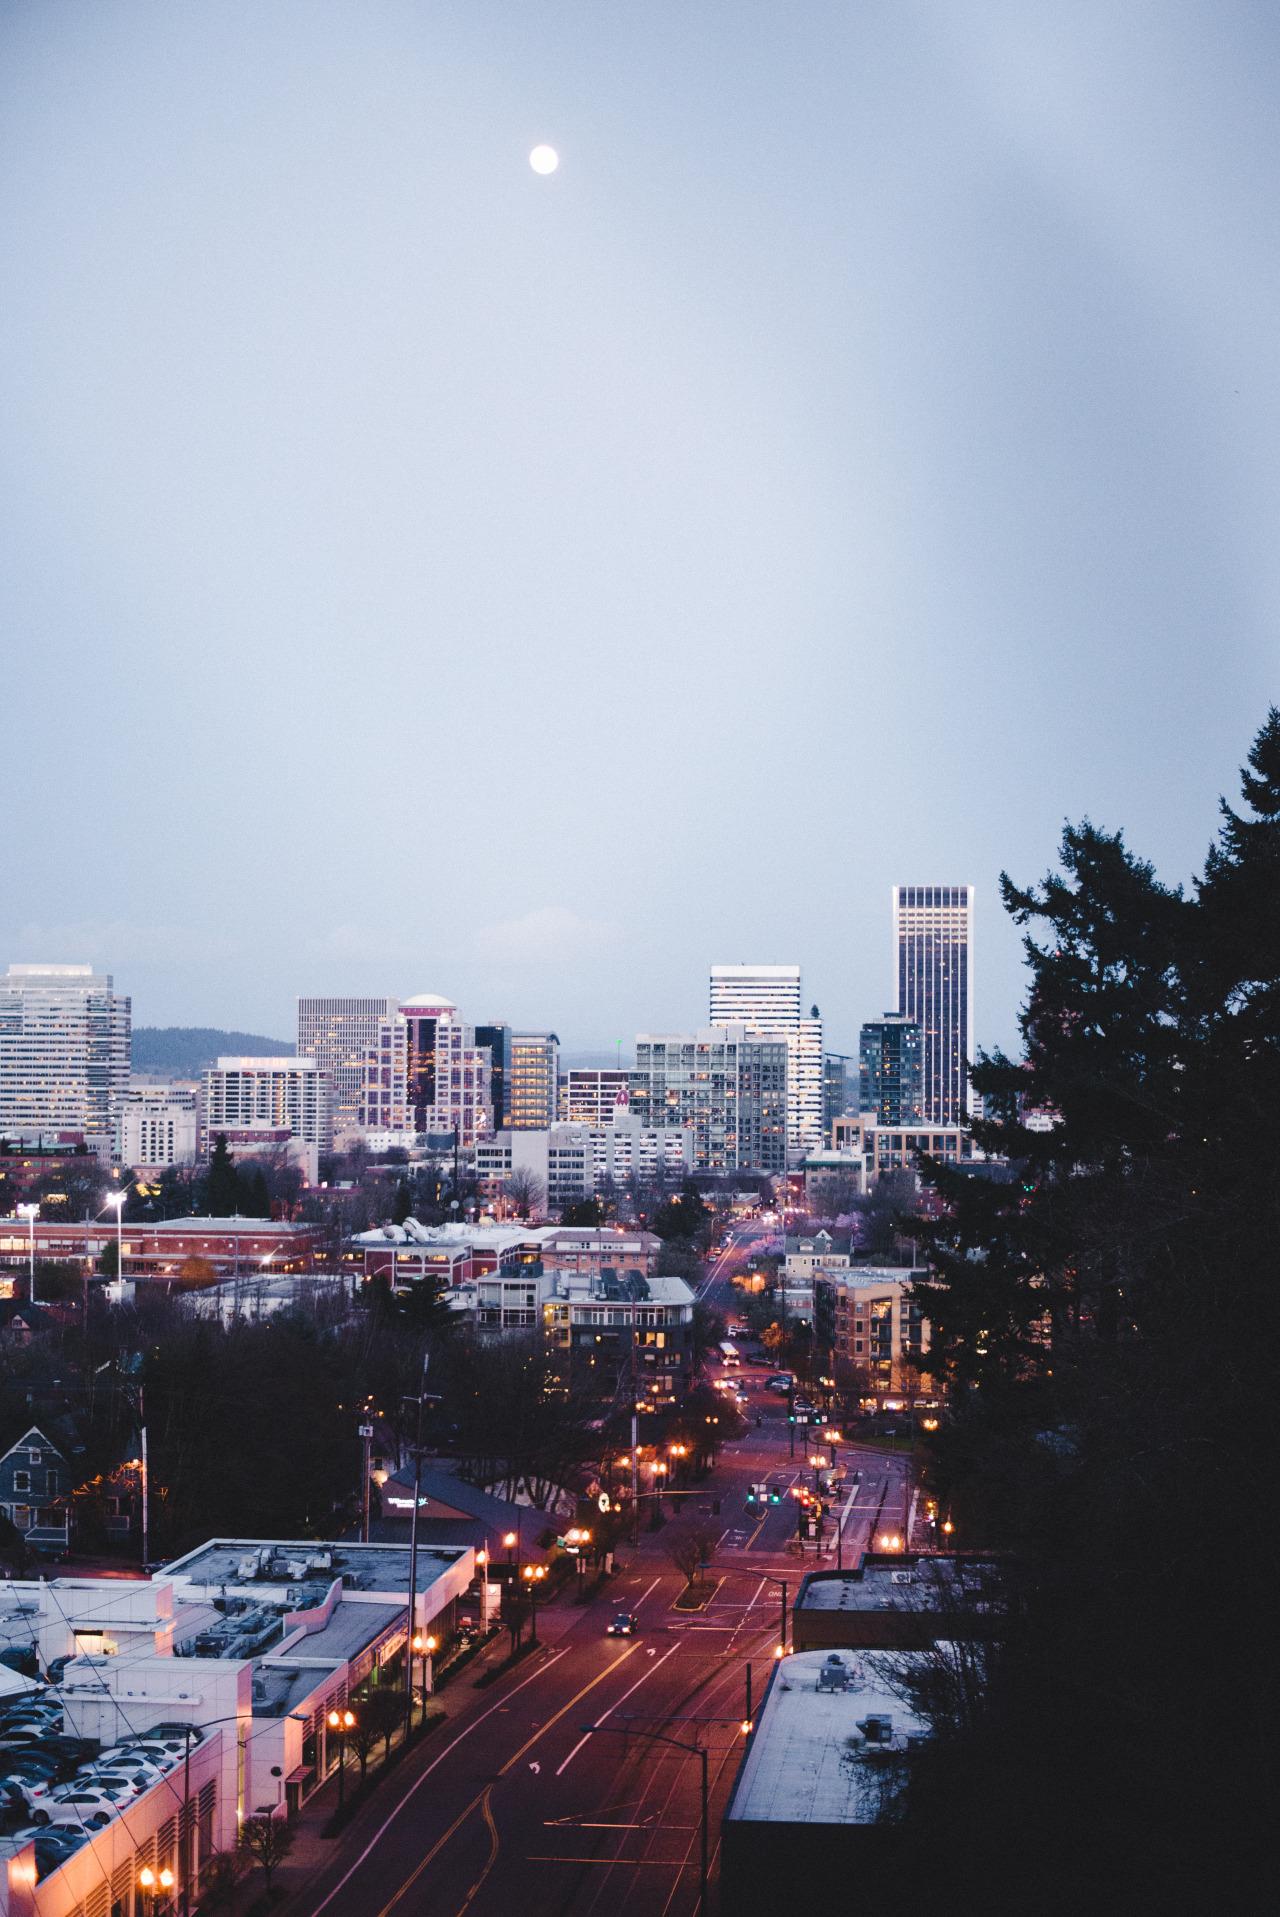 Portland Oregon Fall Had Wallpaper Lights Over The City Photo Wzrd City Lights Instagram